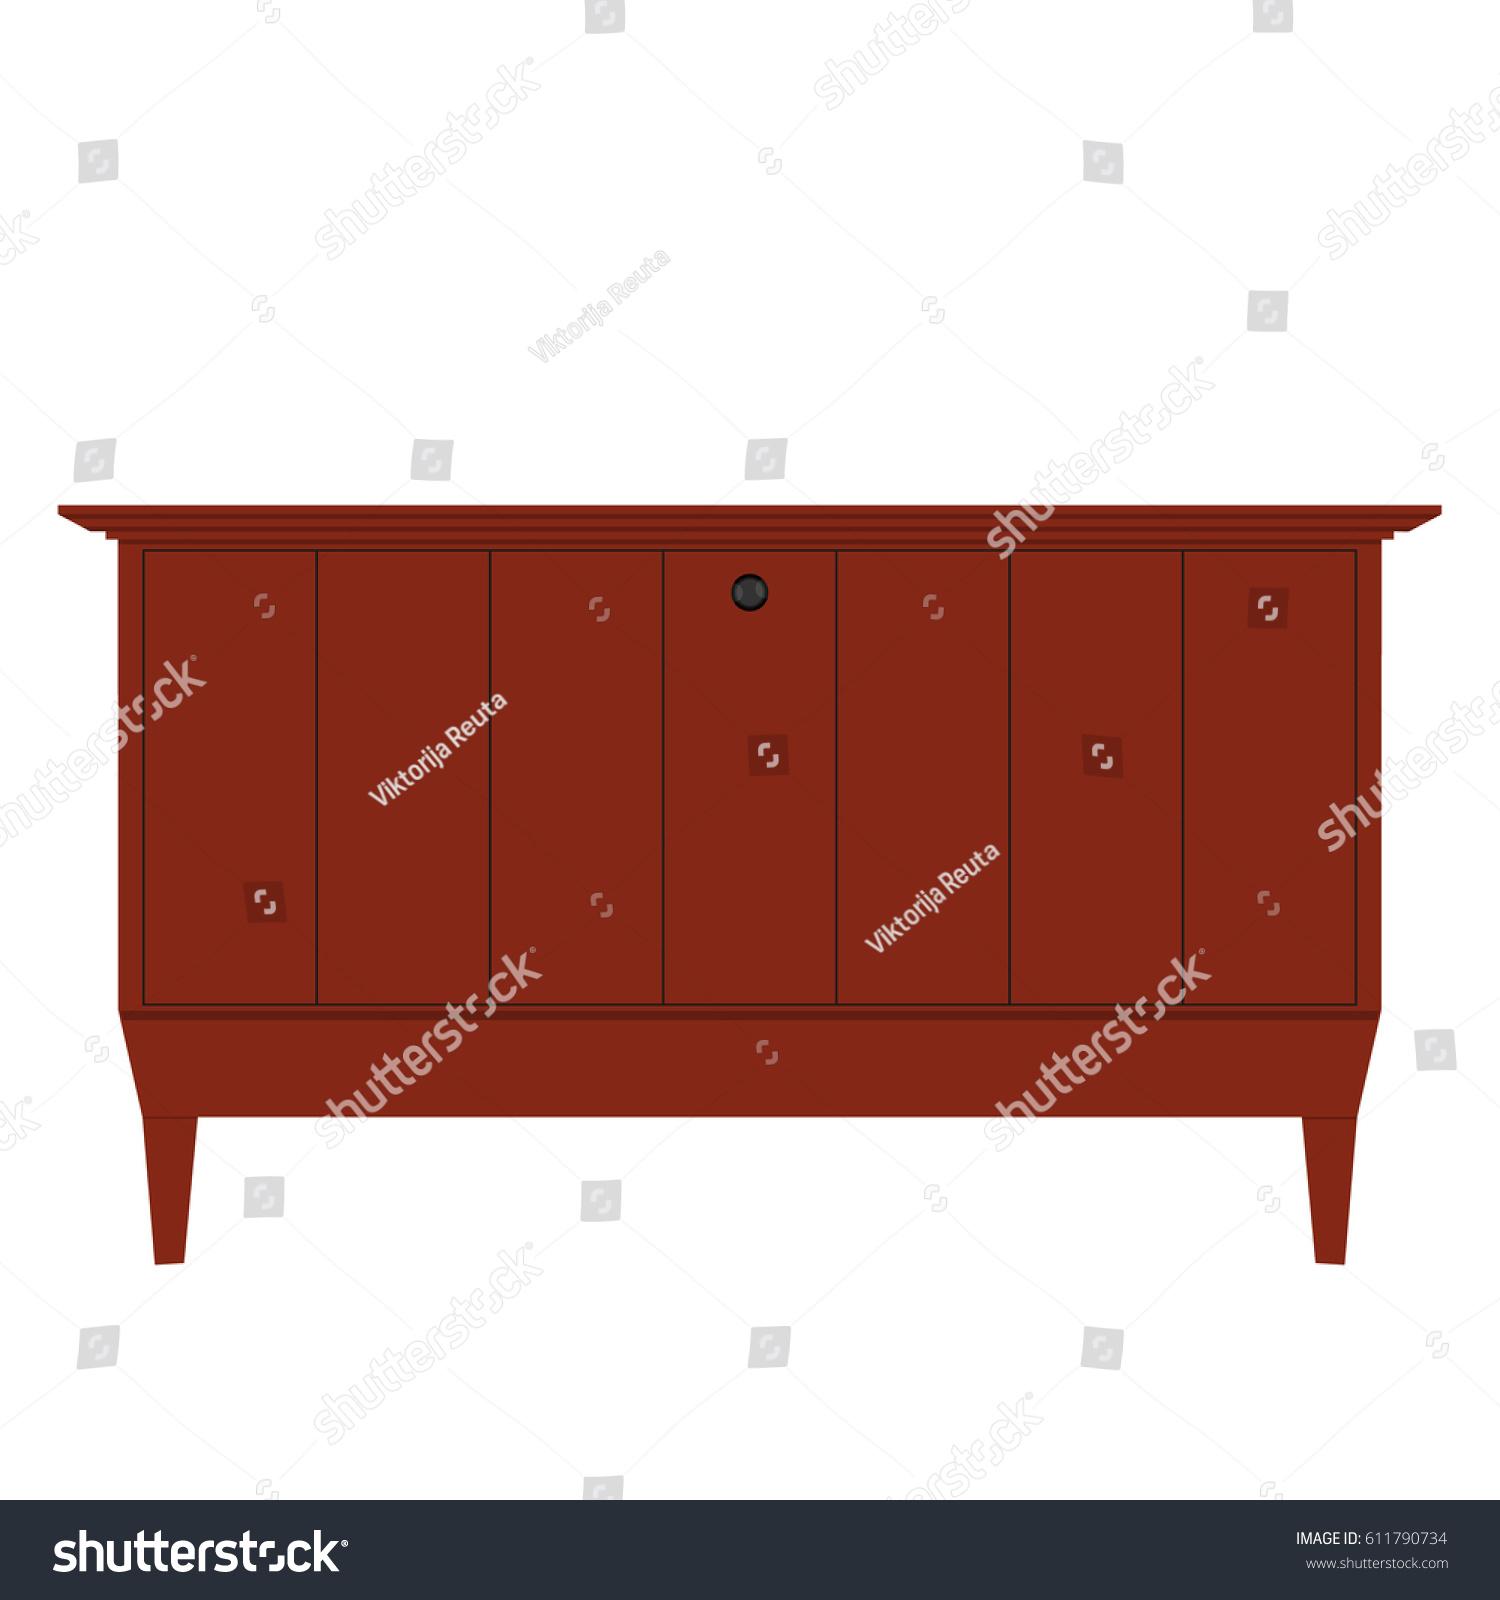 Vector Illustration Wooden Vintage Furniture Tv Stock Vector